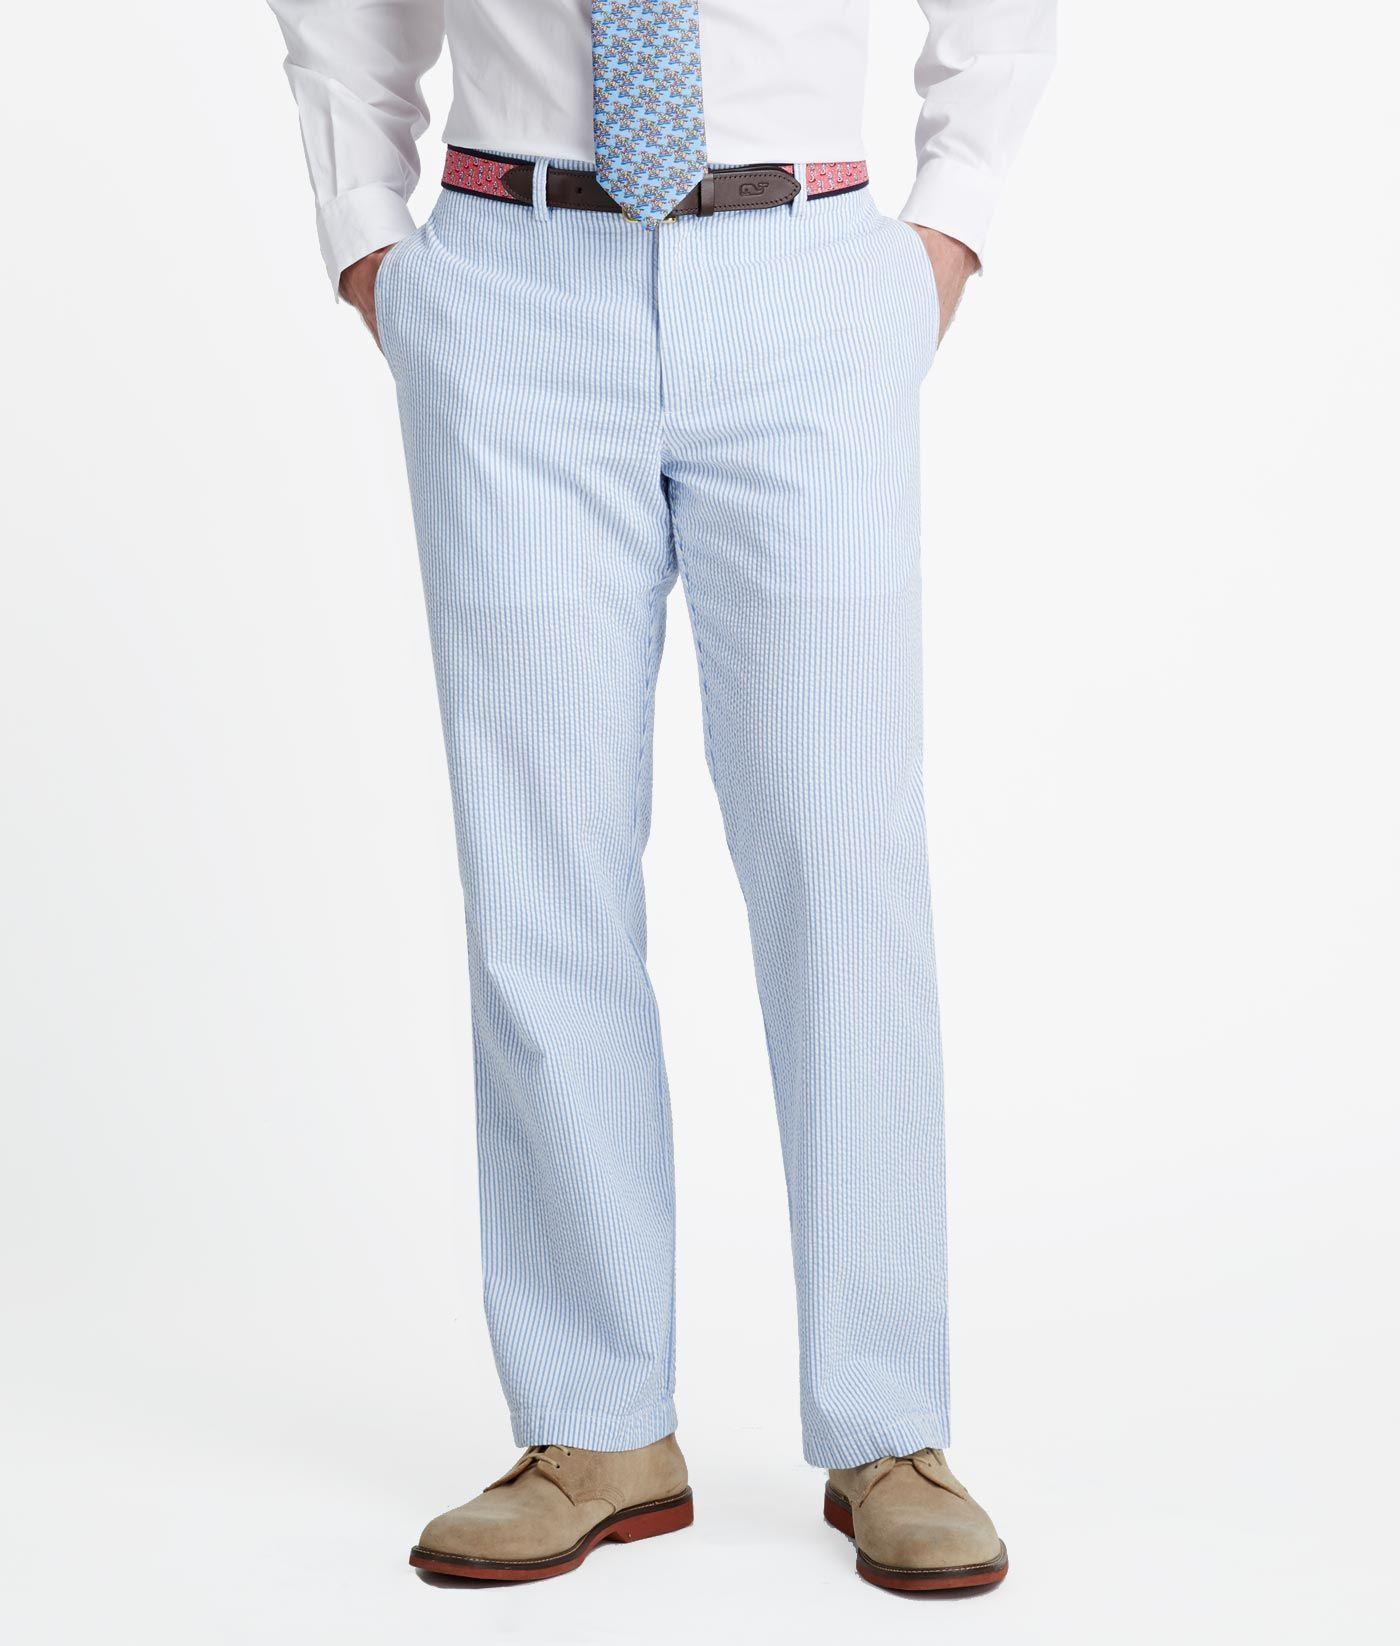 Mens Pants Shop Seersucker Club Pants In Classic Fit For Men